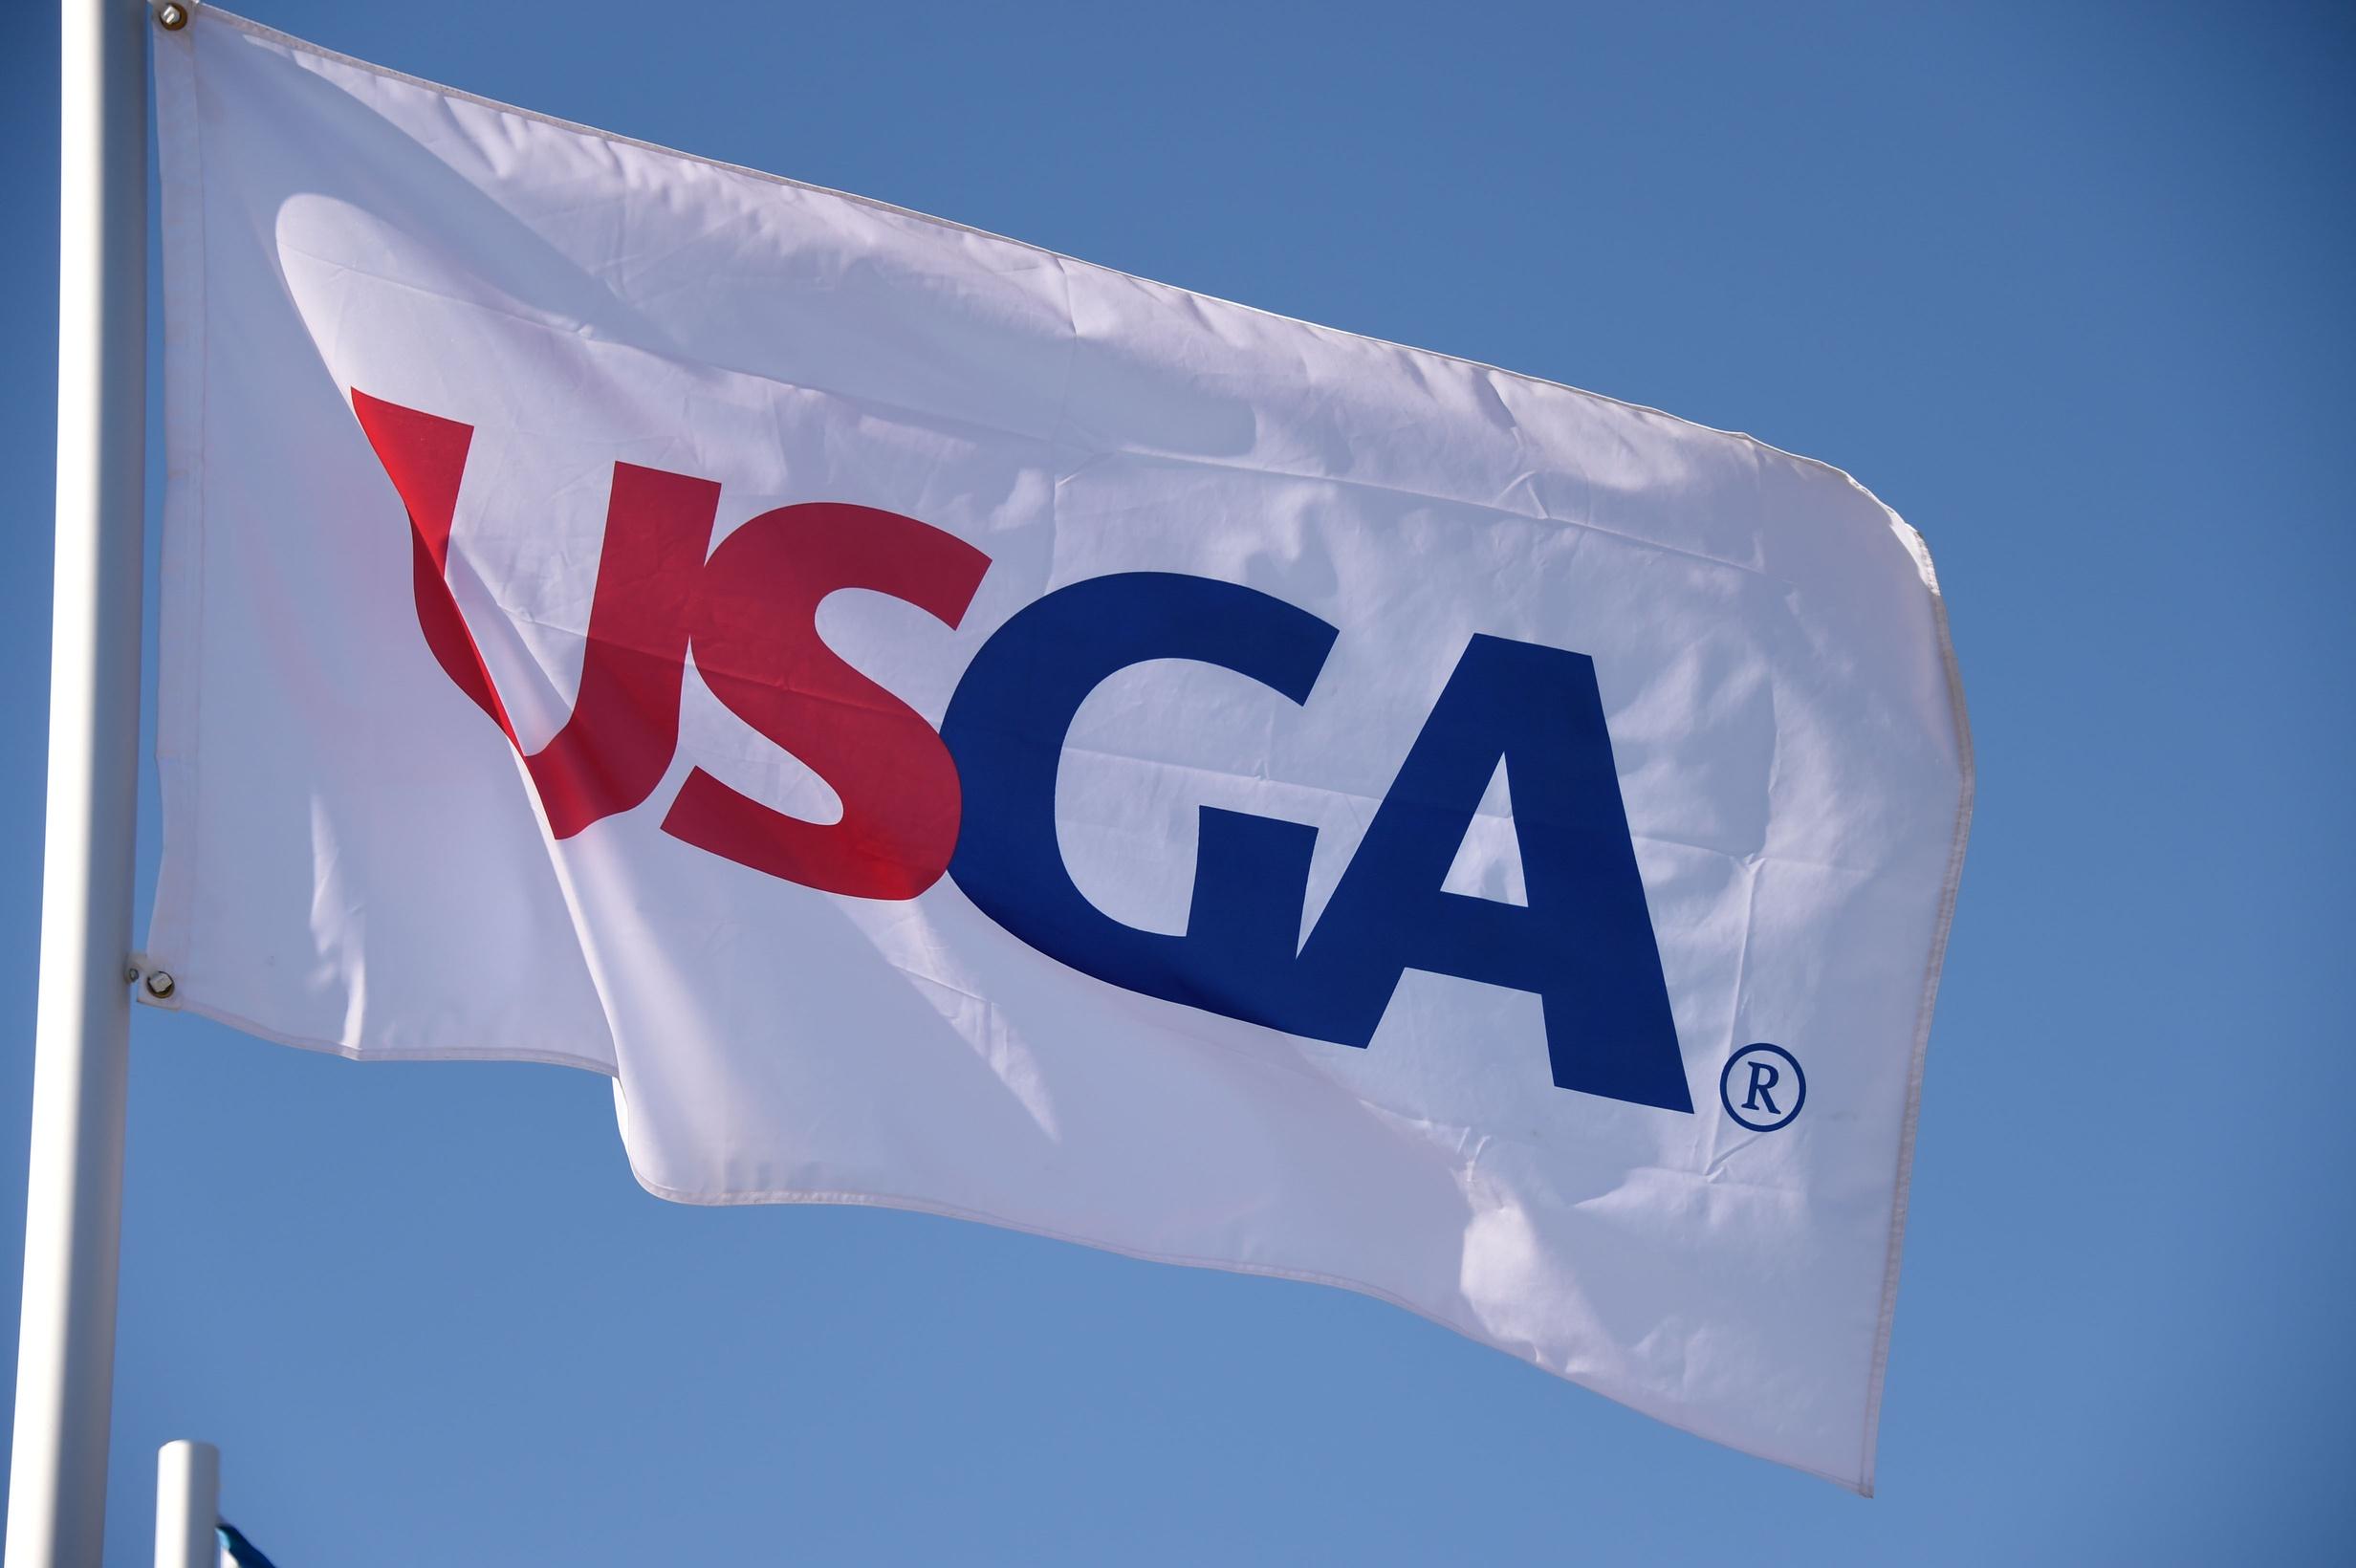 USGA flag